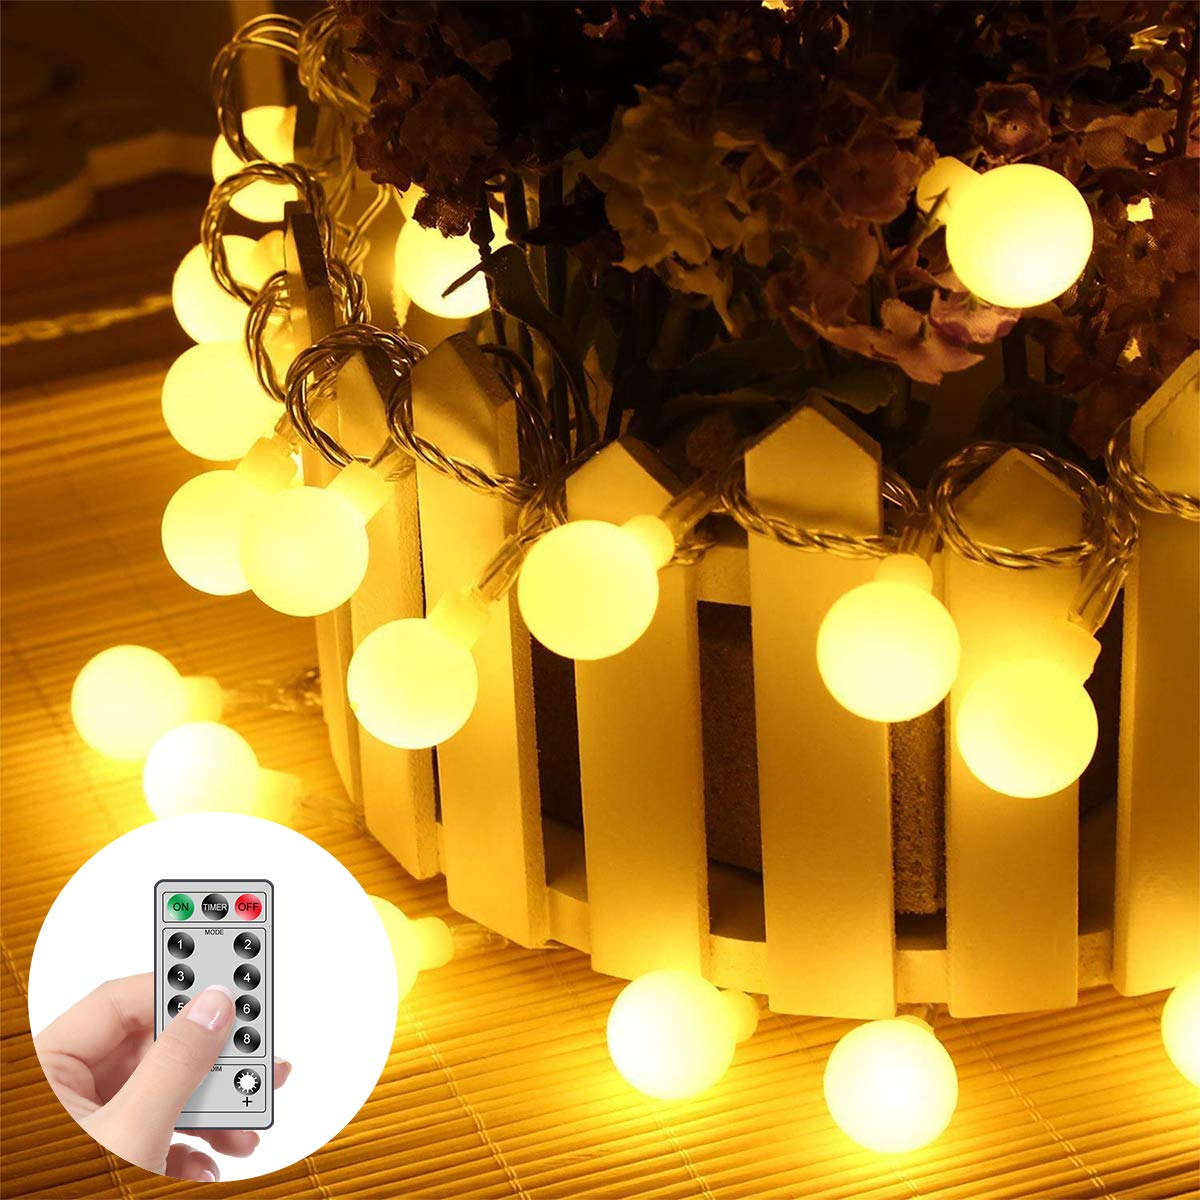 MINGER LED Globe String Lights 14.8ft 40 LED Waterproof Ball Lights 8 Lighting Modes Battery Powered Starry Fairy String Lights for Bedroom Garden Christmas Tree Wedding Party